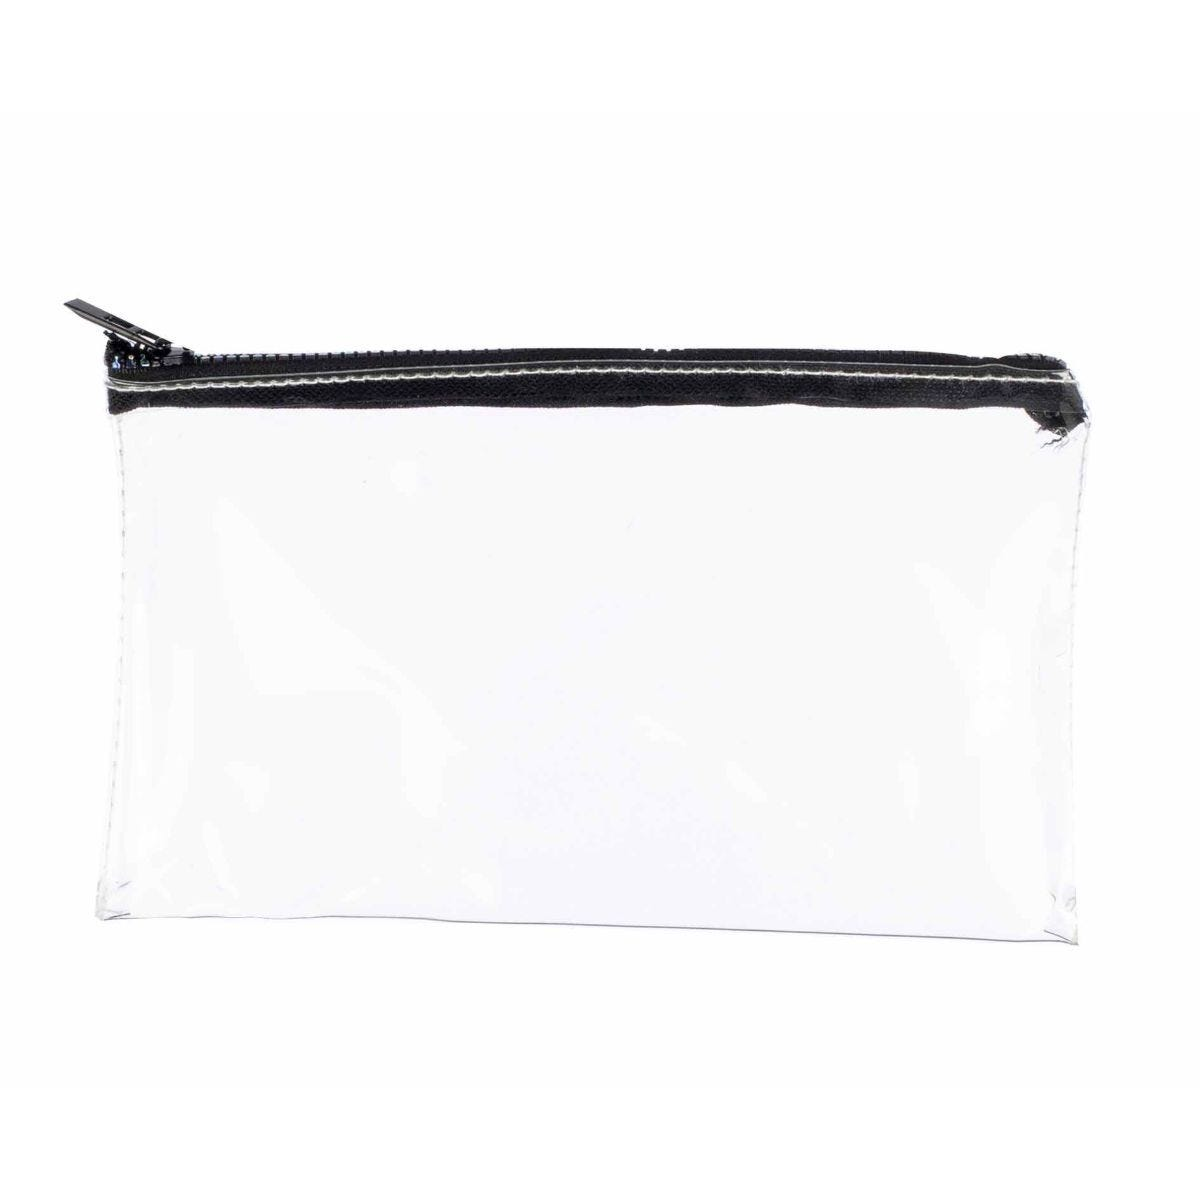 Clear Oil Slick Zip Flat Pencil Case 8x5